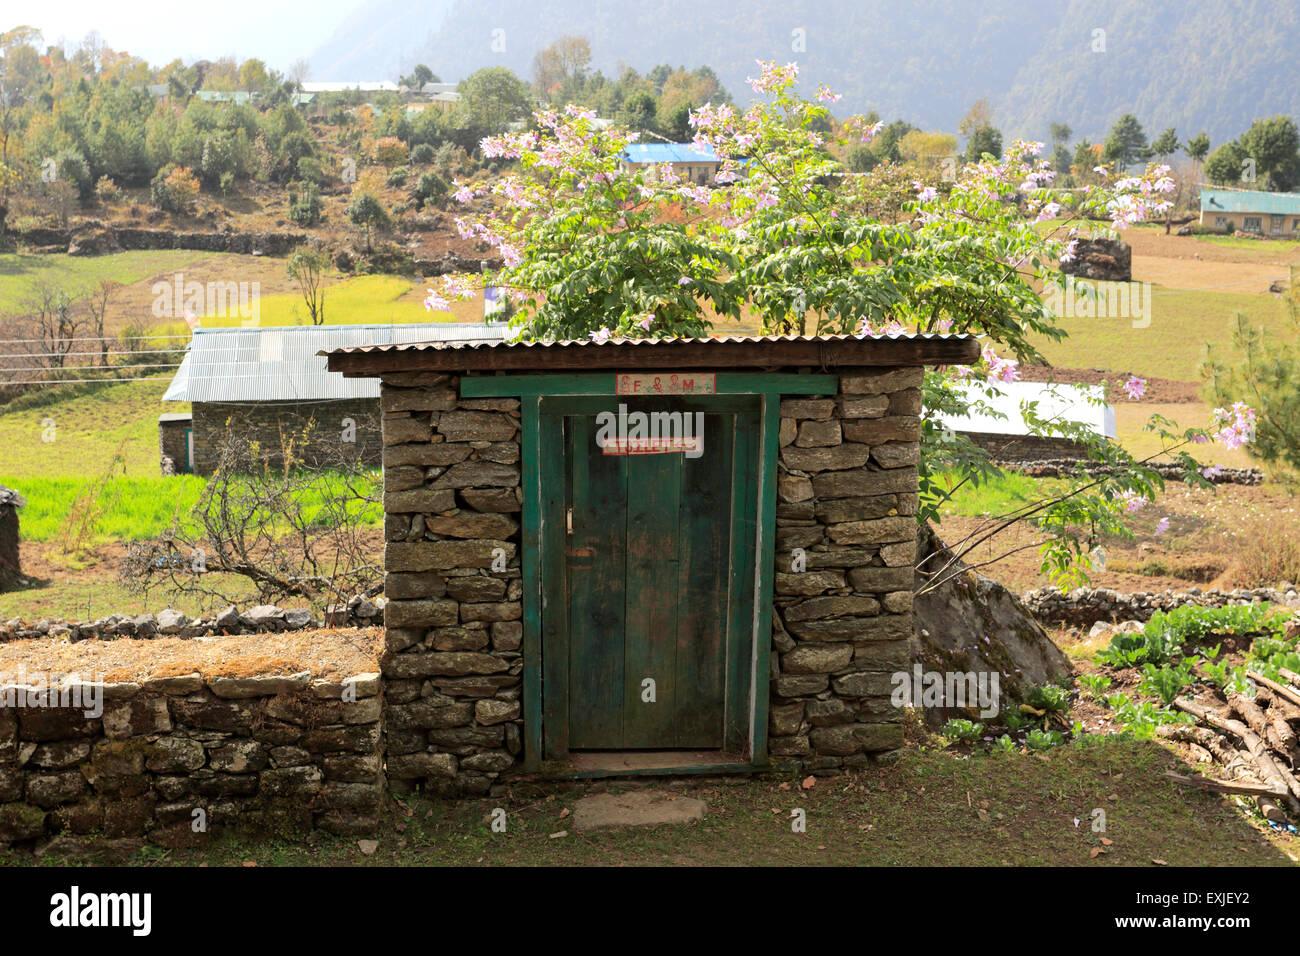 Outside toilet, Lukla village, Sagarmatha National Park, Solu-Khumbu district, Khumbu region, Eastern Nepal, Asia. - Stock Image